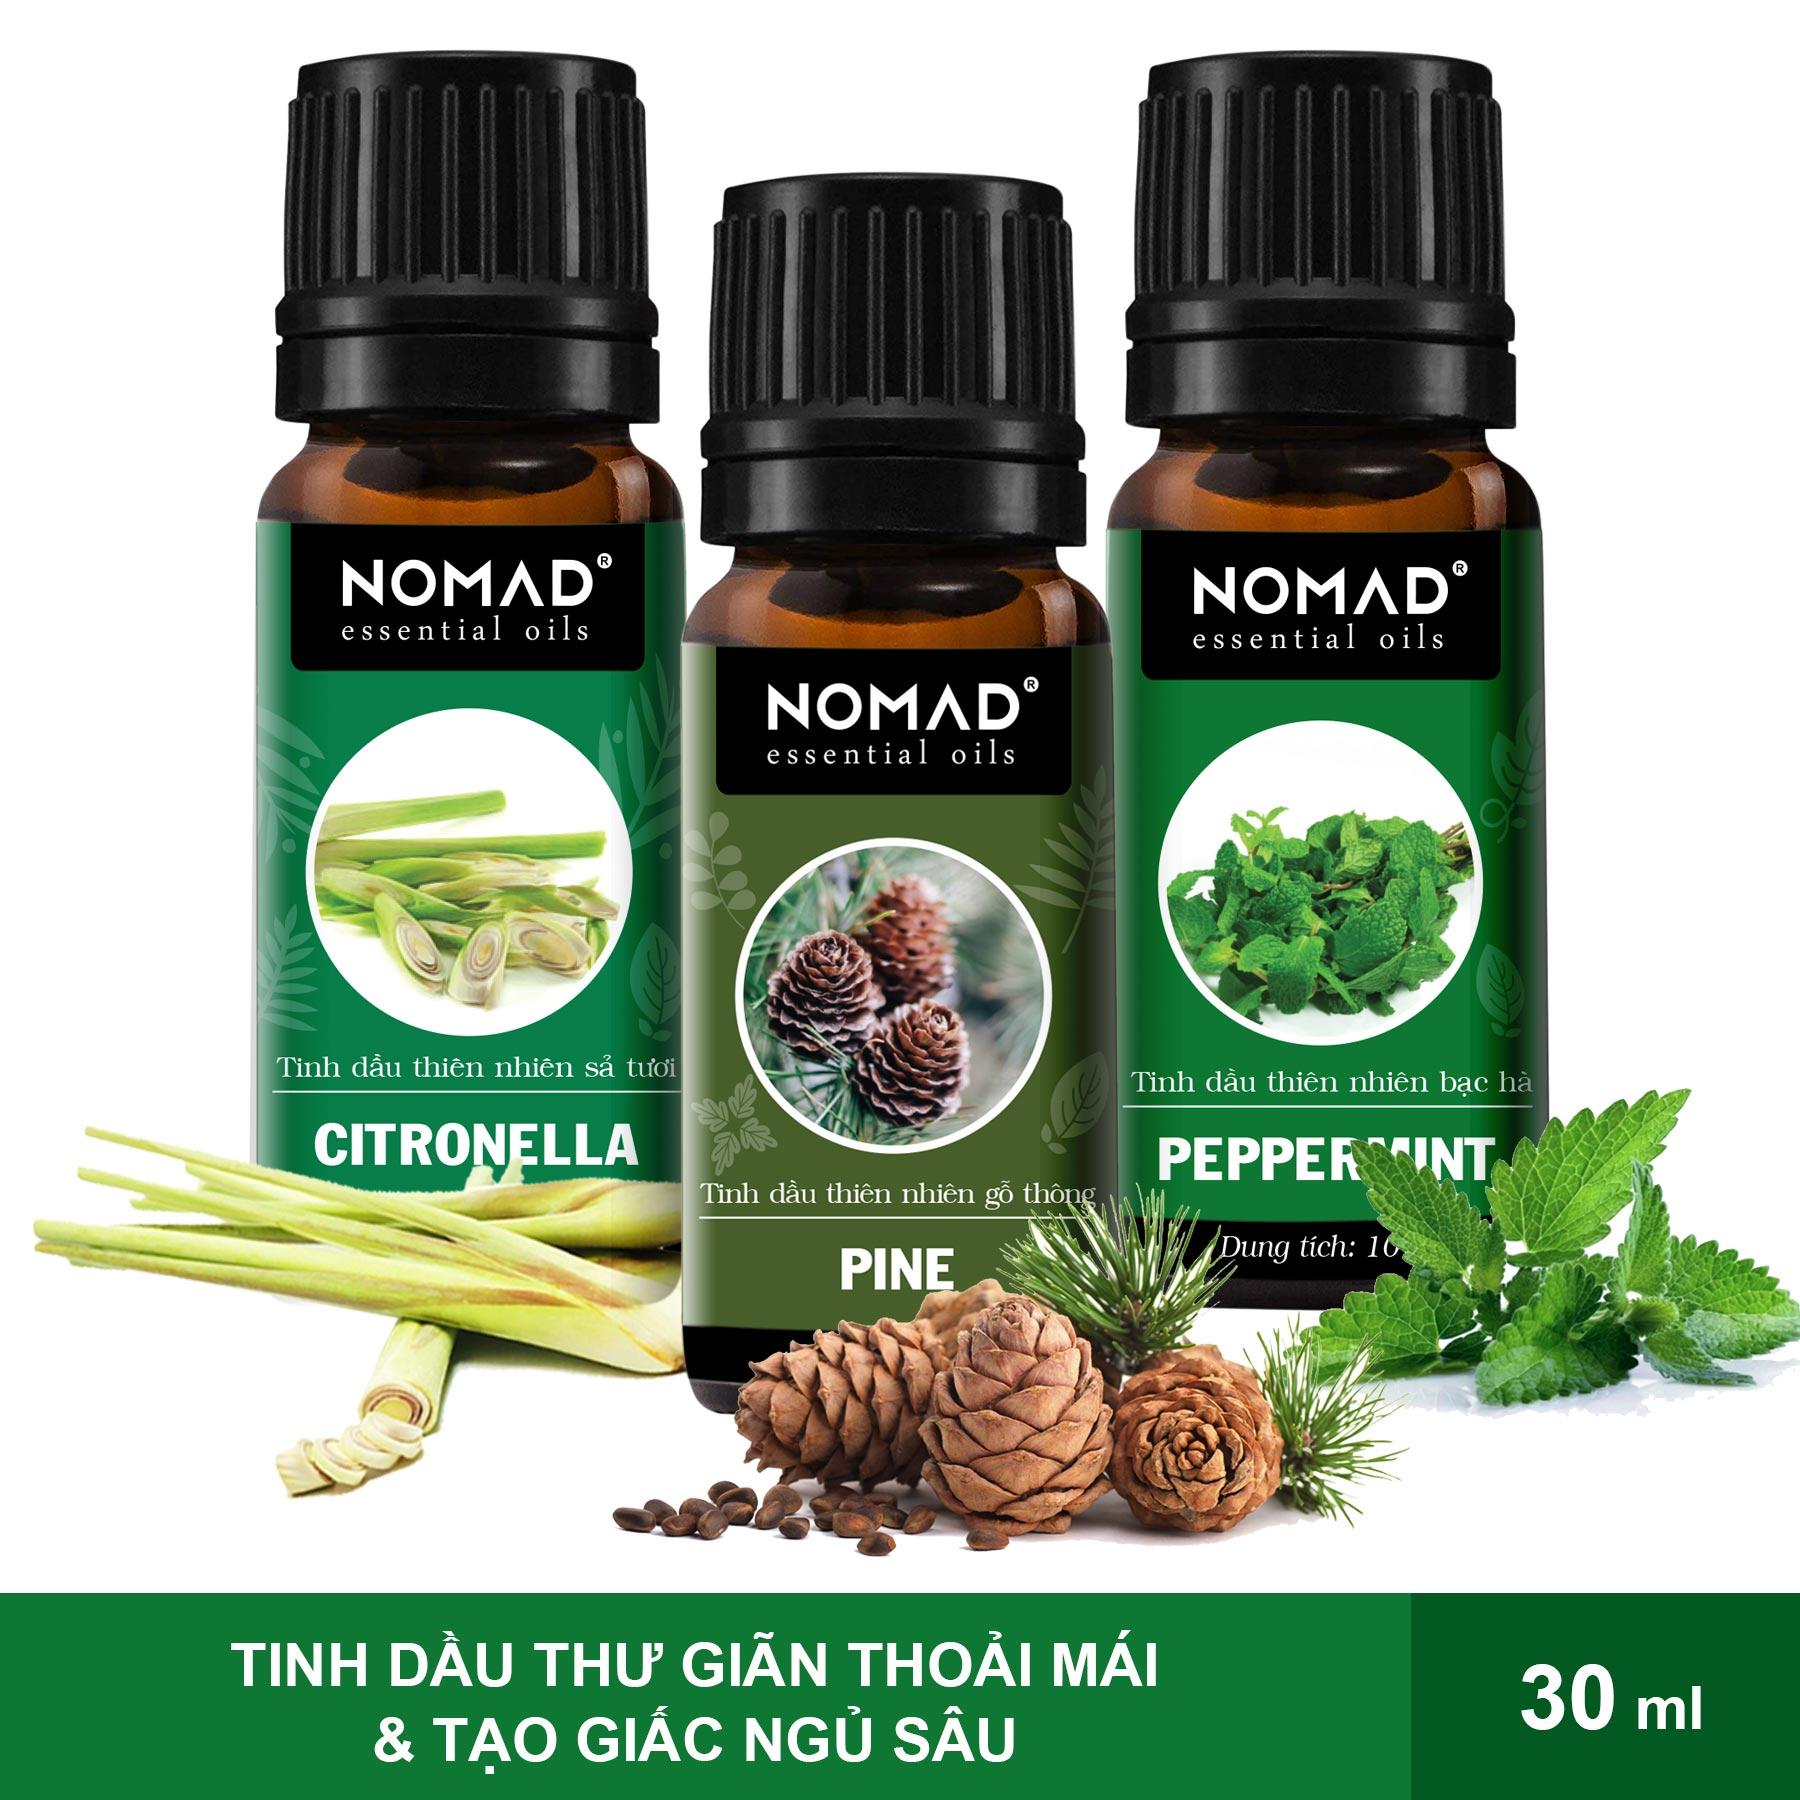 combo-3-tinh-dau-nomad-giup-thu-gian-thoai-mai-tao-giac-ngu-sau-sa-tuoi-go-thong-bac-ha-30ml